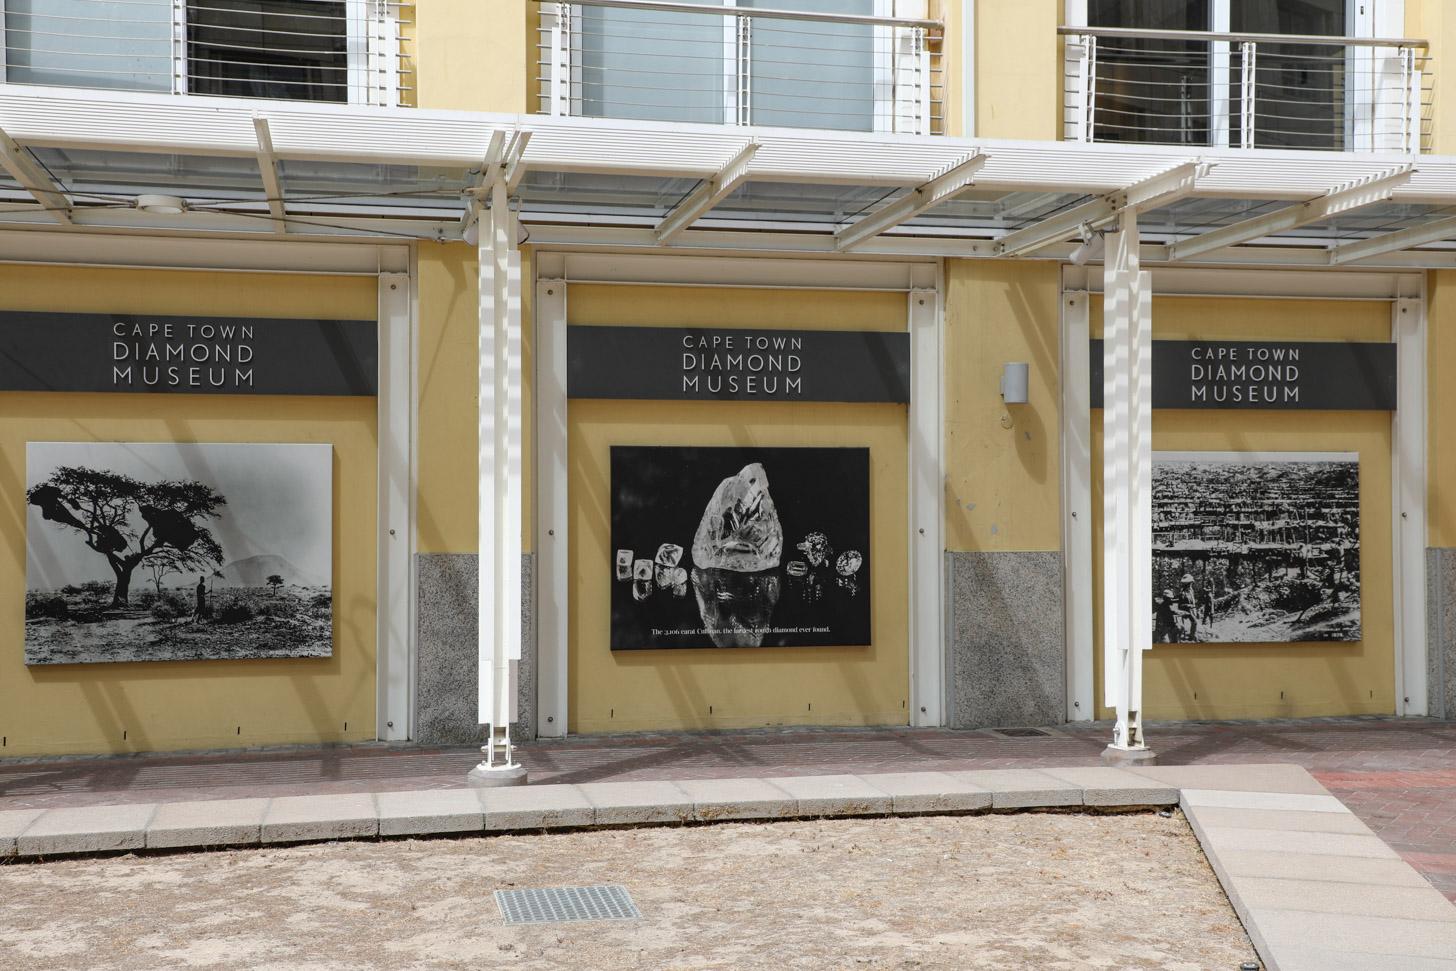 Diamantmuseum in Kaapstad